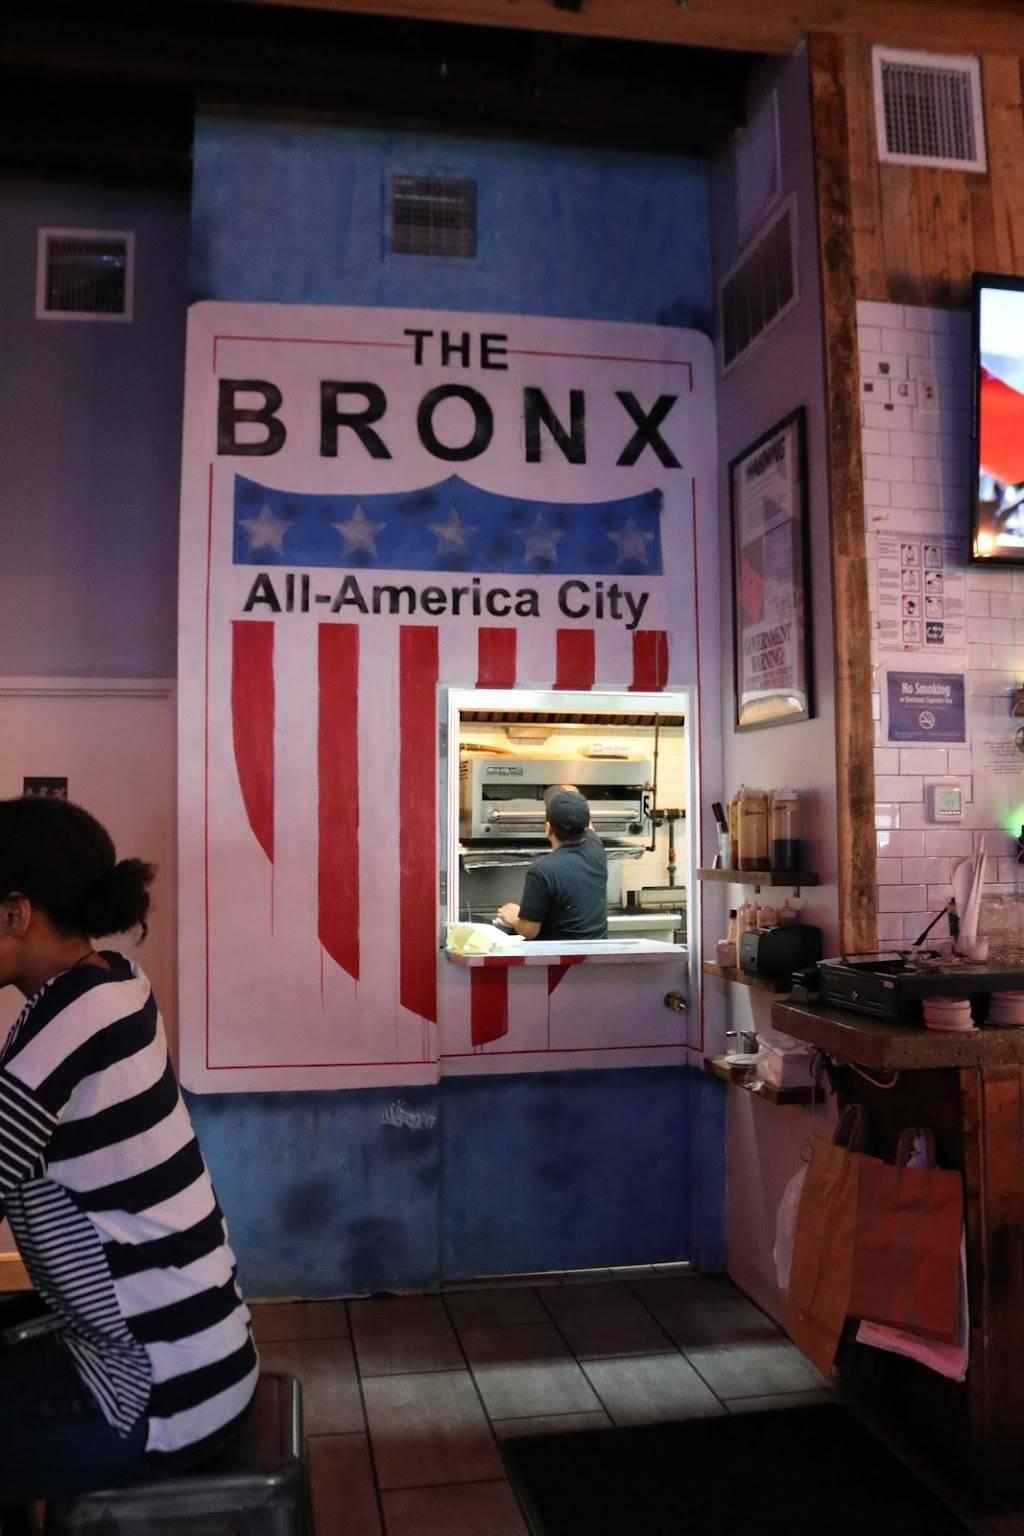 The Bronx Public | restaurant | 170 W 231st St, Bronx, NY 10463, USA | 7187086447 OR +1 718-708-6447